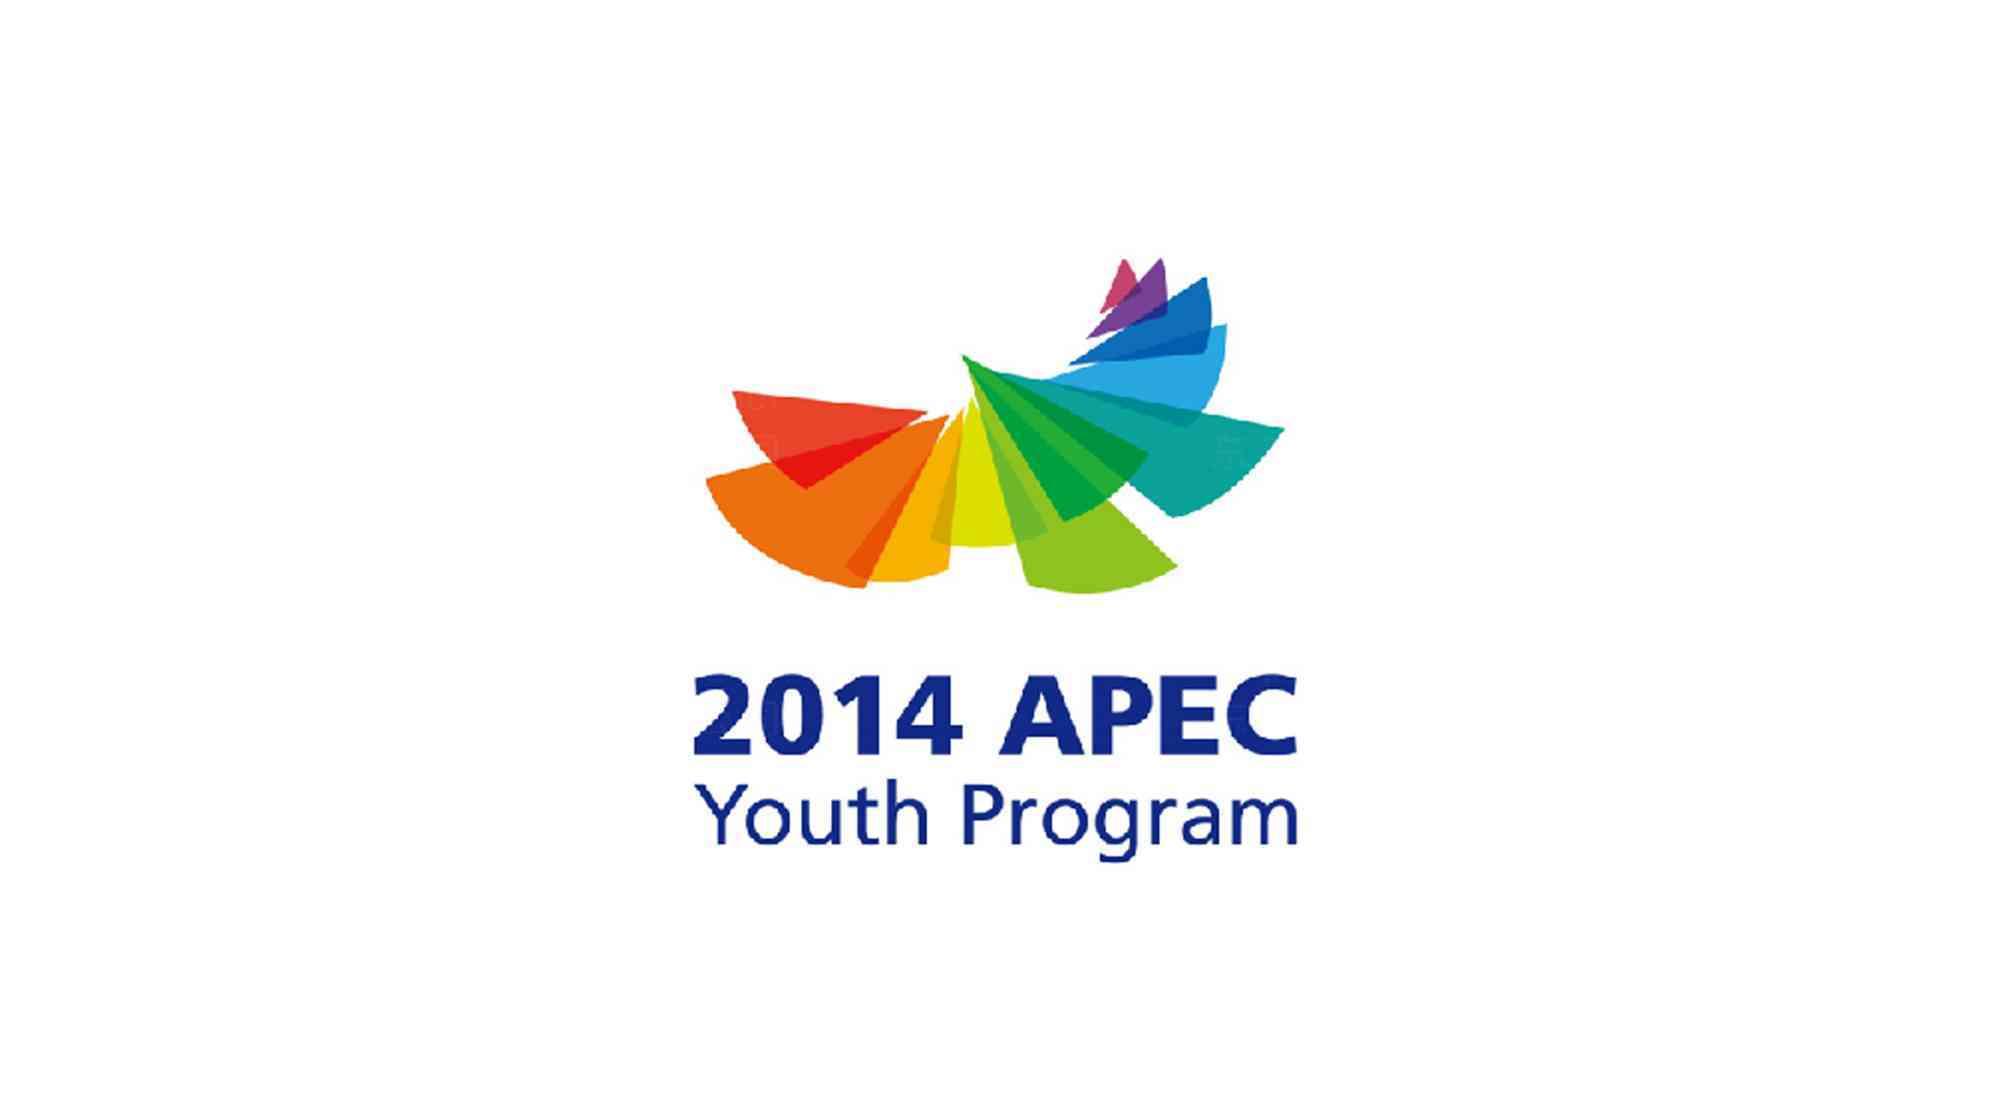 青年APEC會議LOGO設計、VI設計